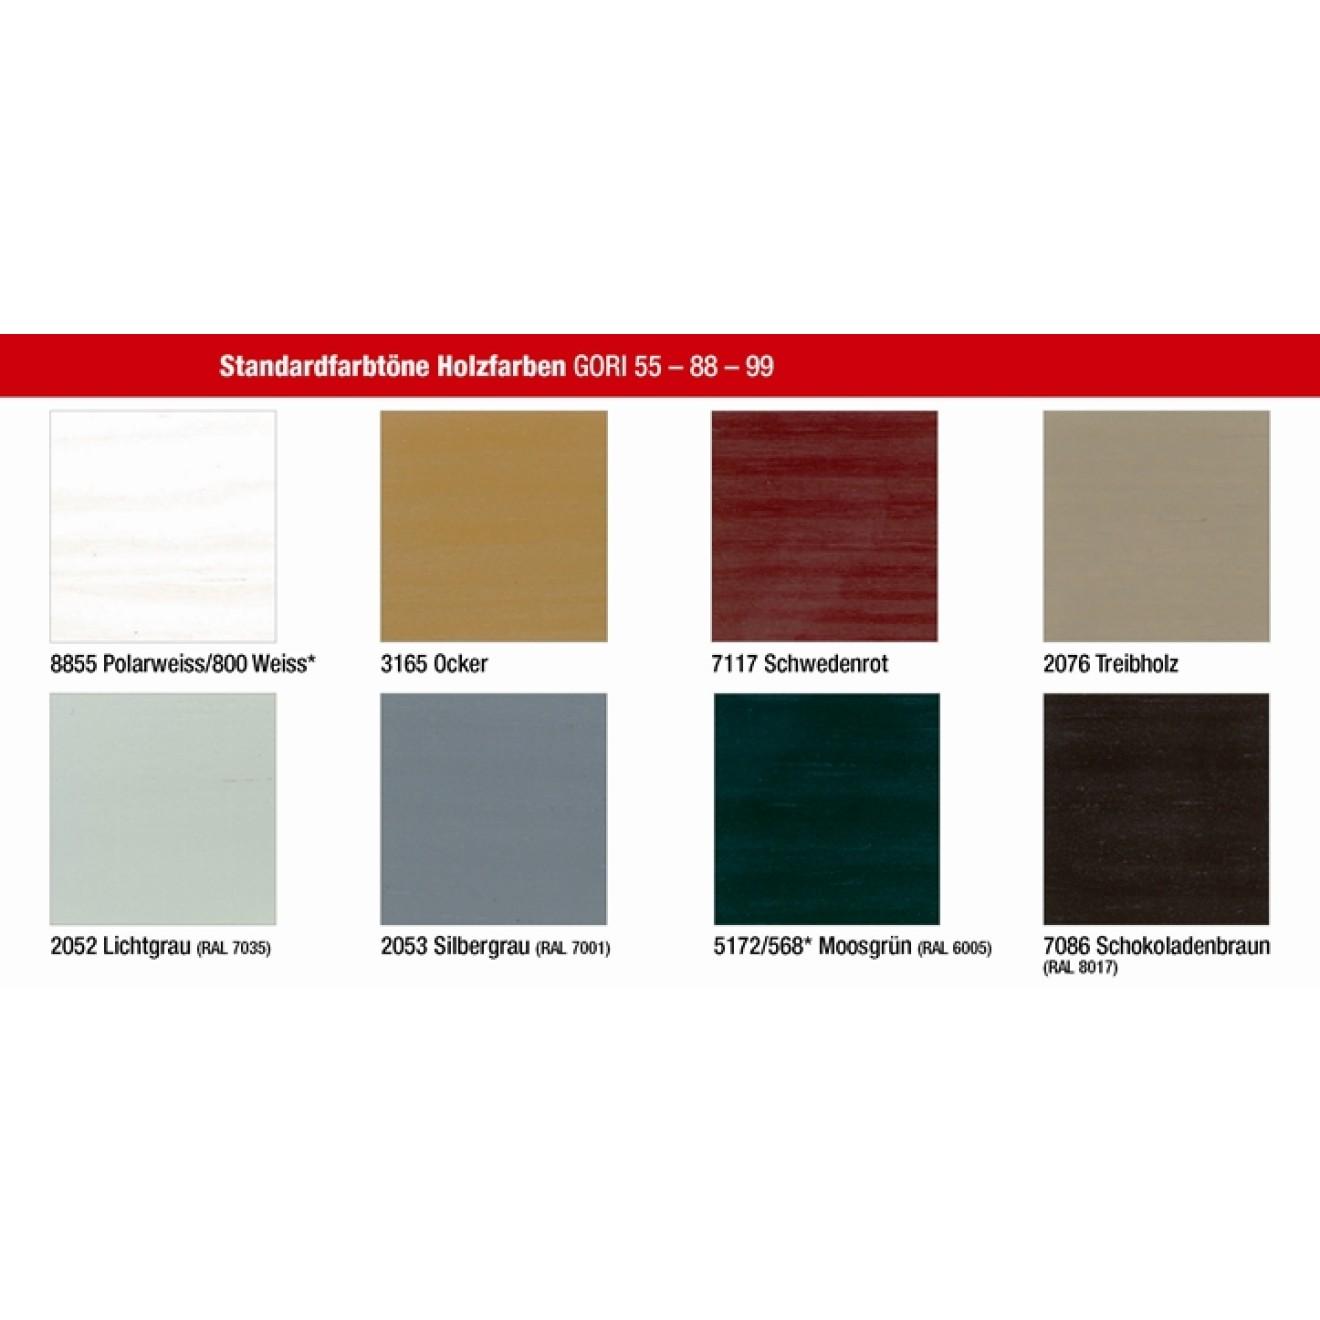 gori 99 holzfassaden farbe g nstig im. Black Bedroom Furniture Sets. Home Design Ideas